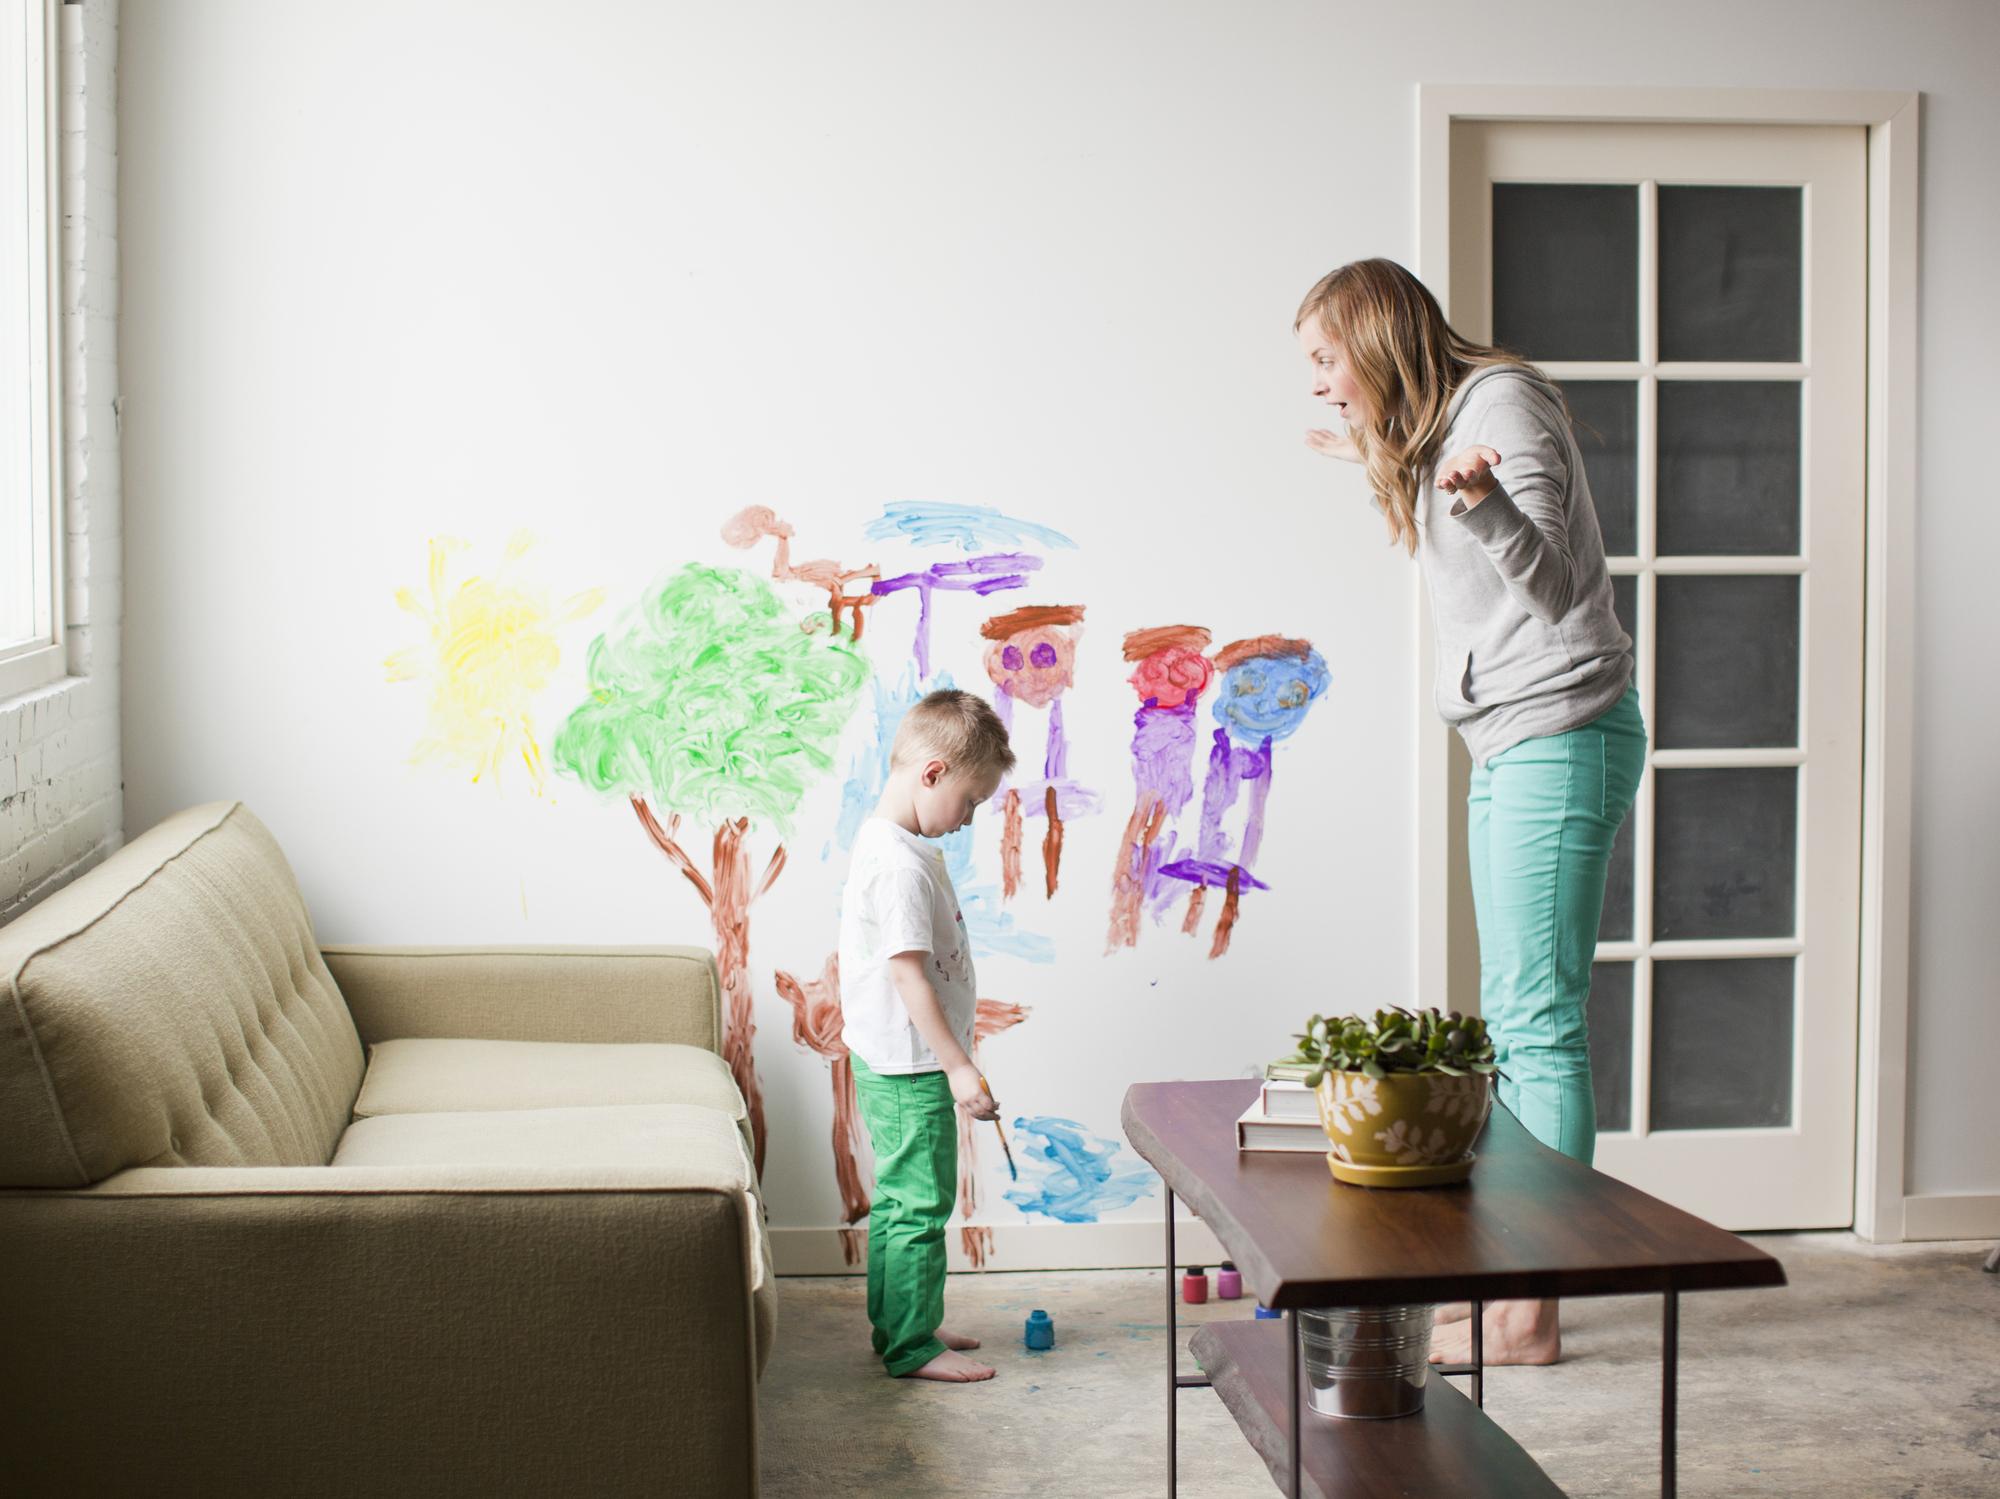 17 ways my kids make me lose my s***